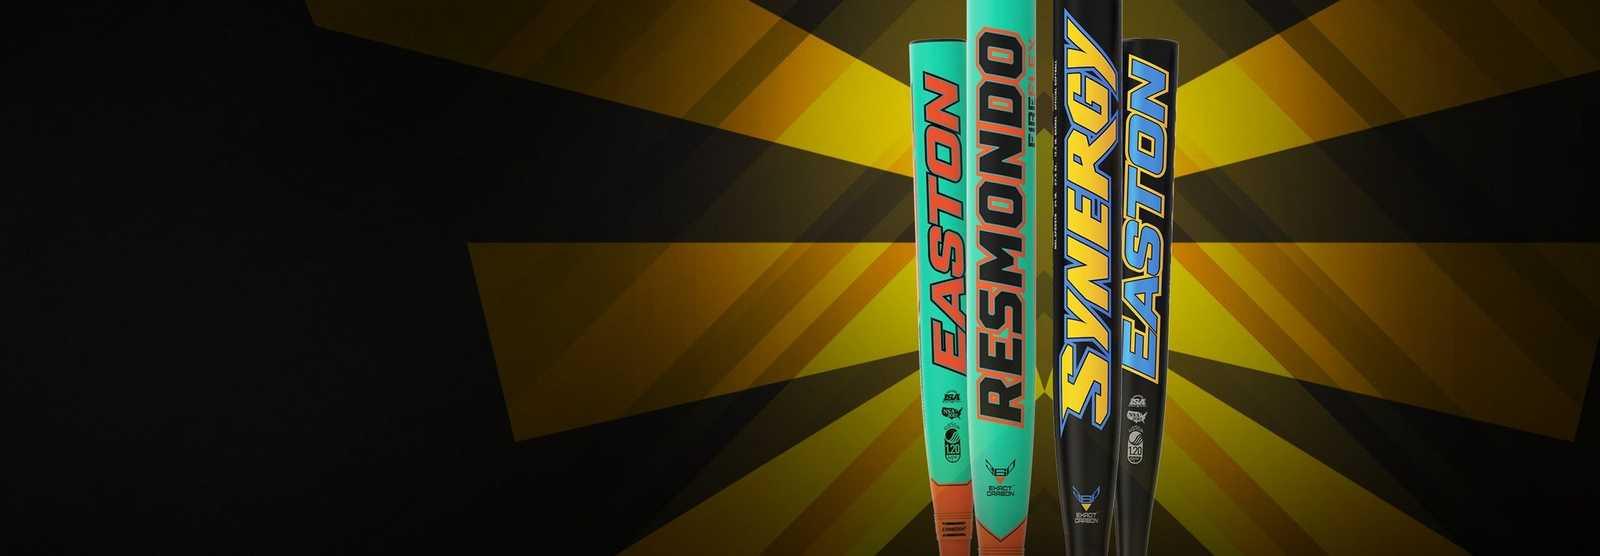 synergy-resmondo-slowpitch-bats-homepage